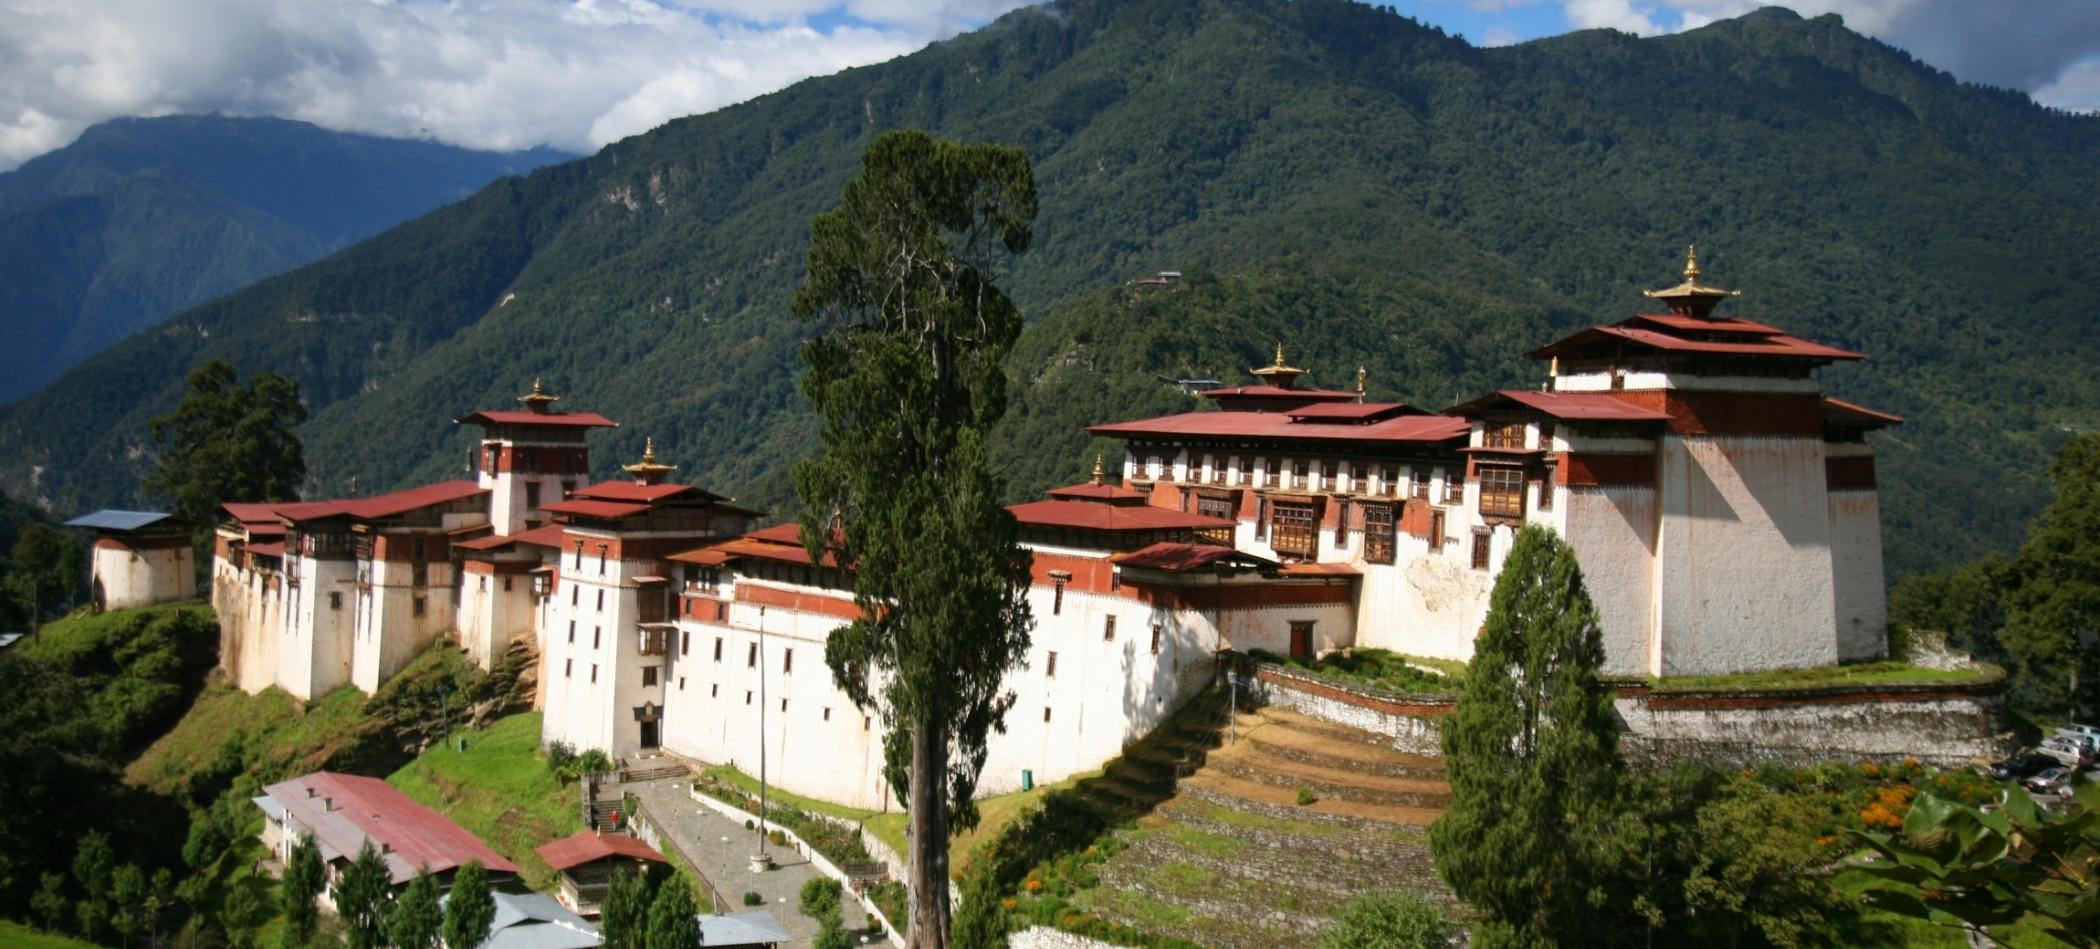 bhutan_tourism_travel_trekking_day_hike_festivals